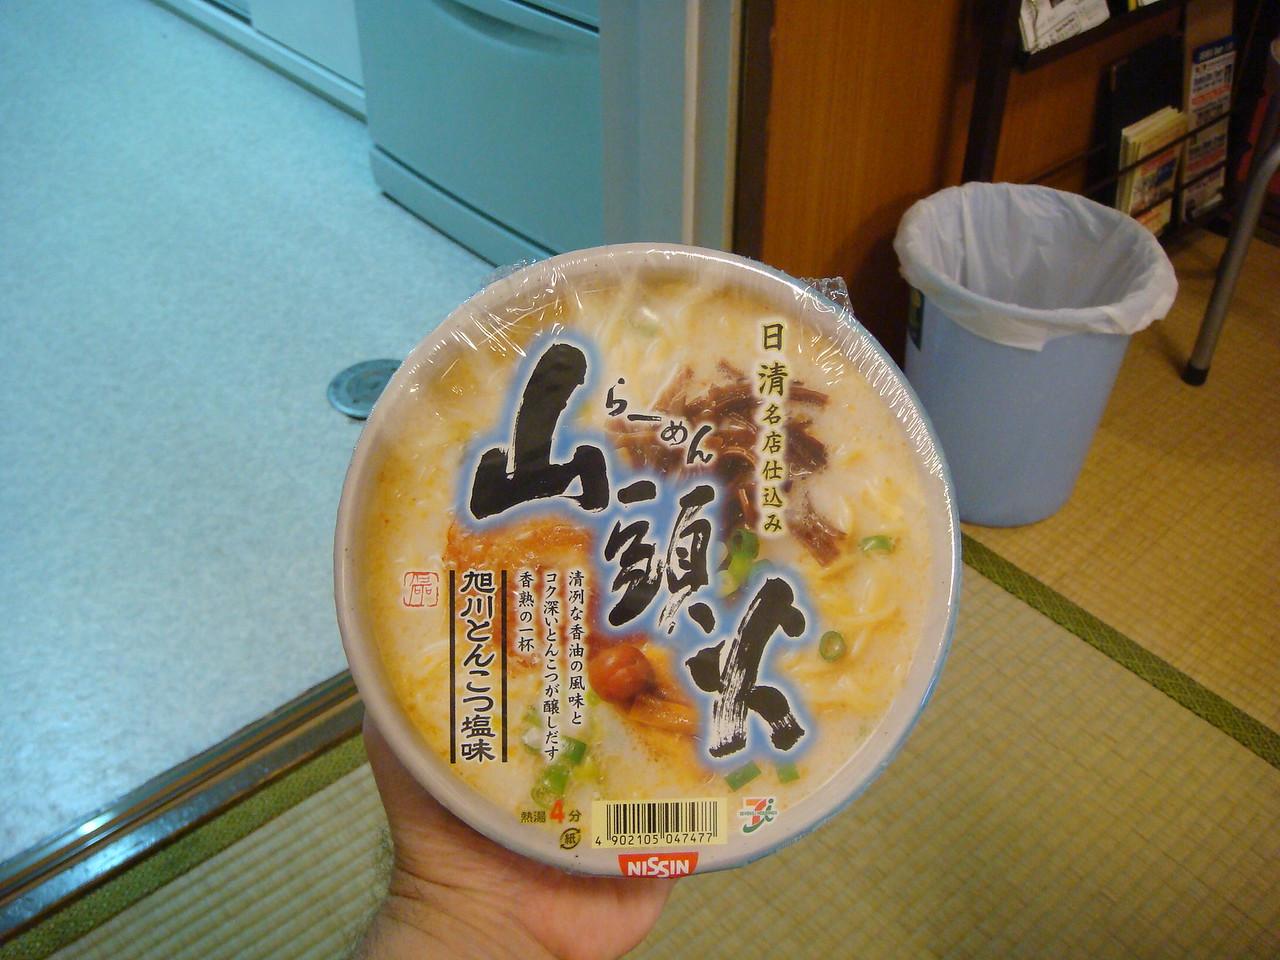 Instant cup noodle in Tokyo, Japan